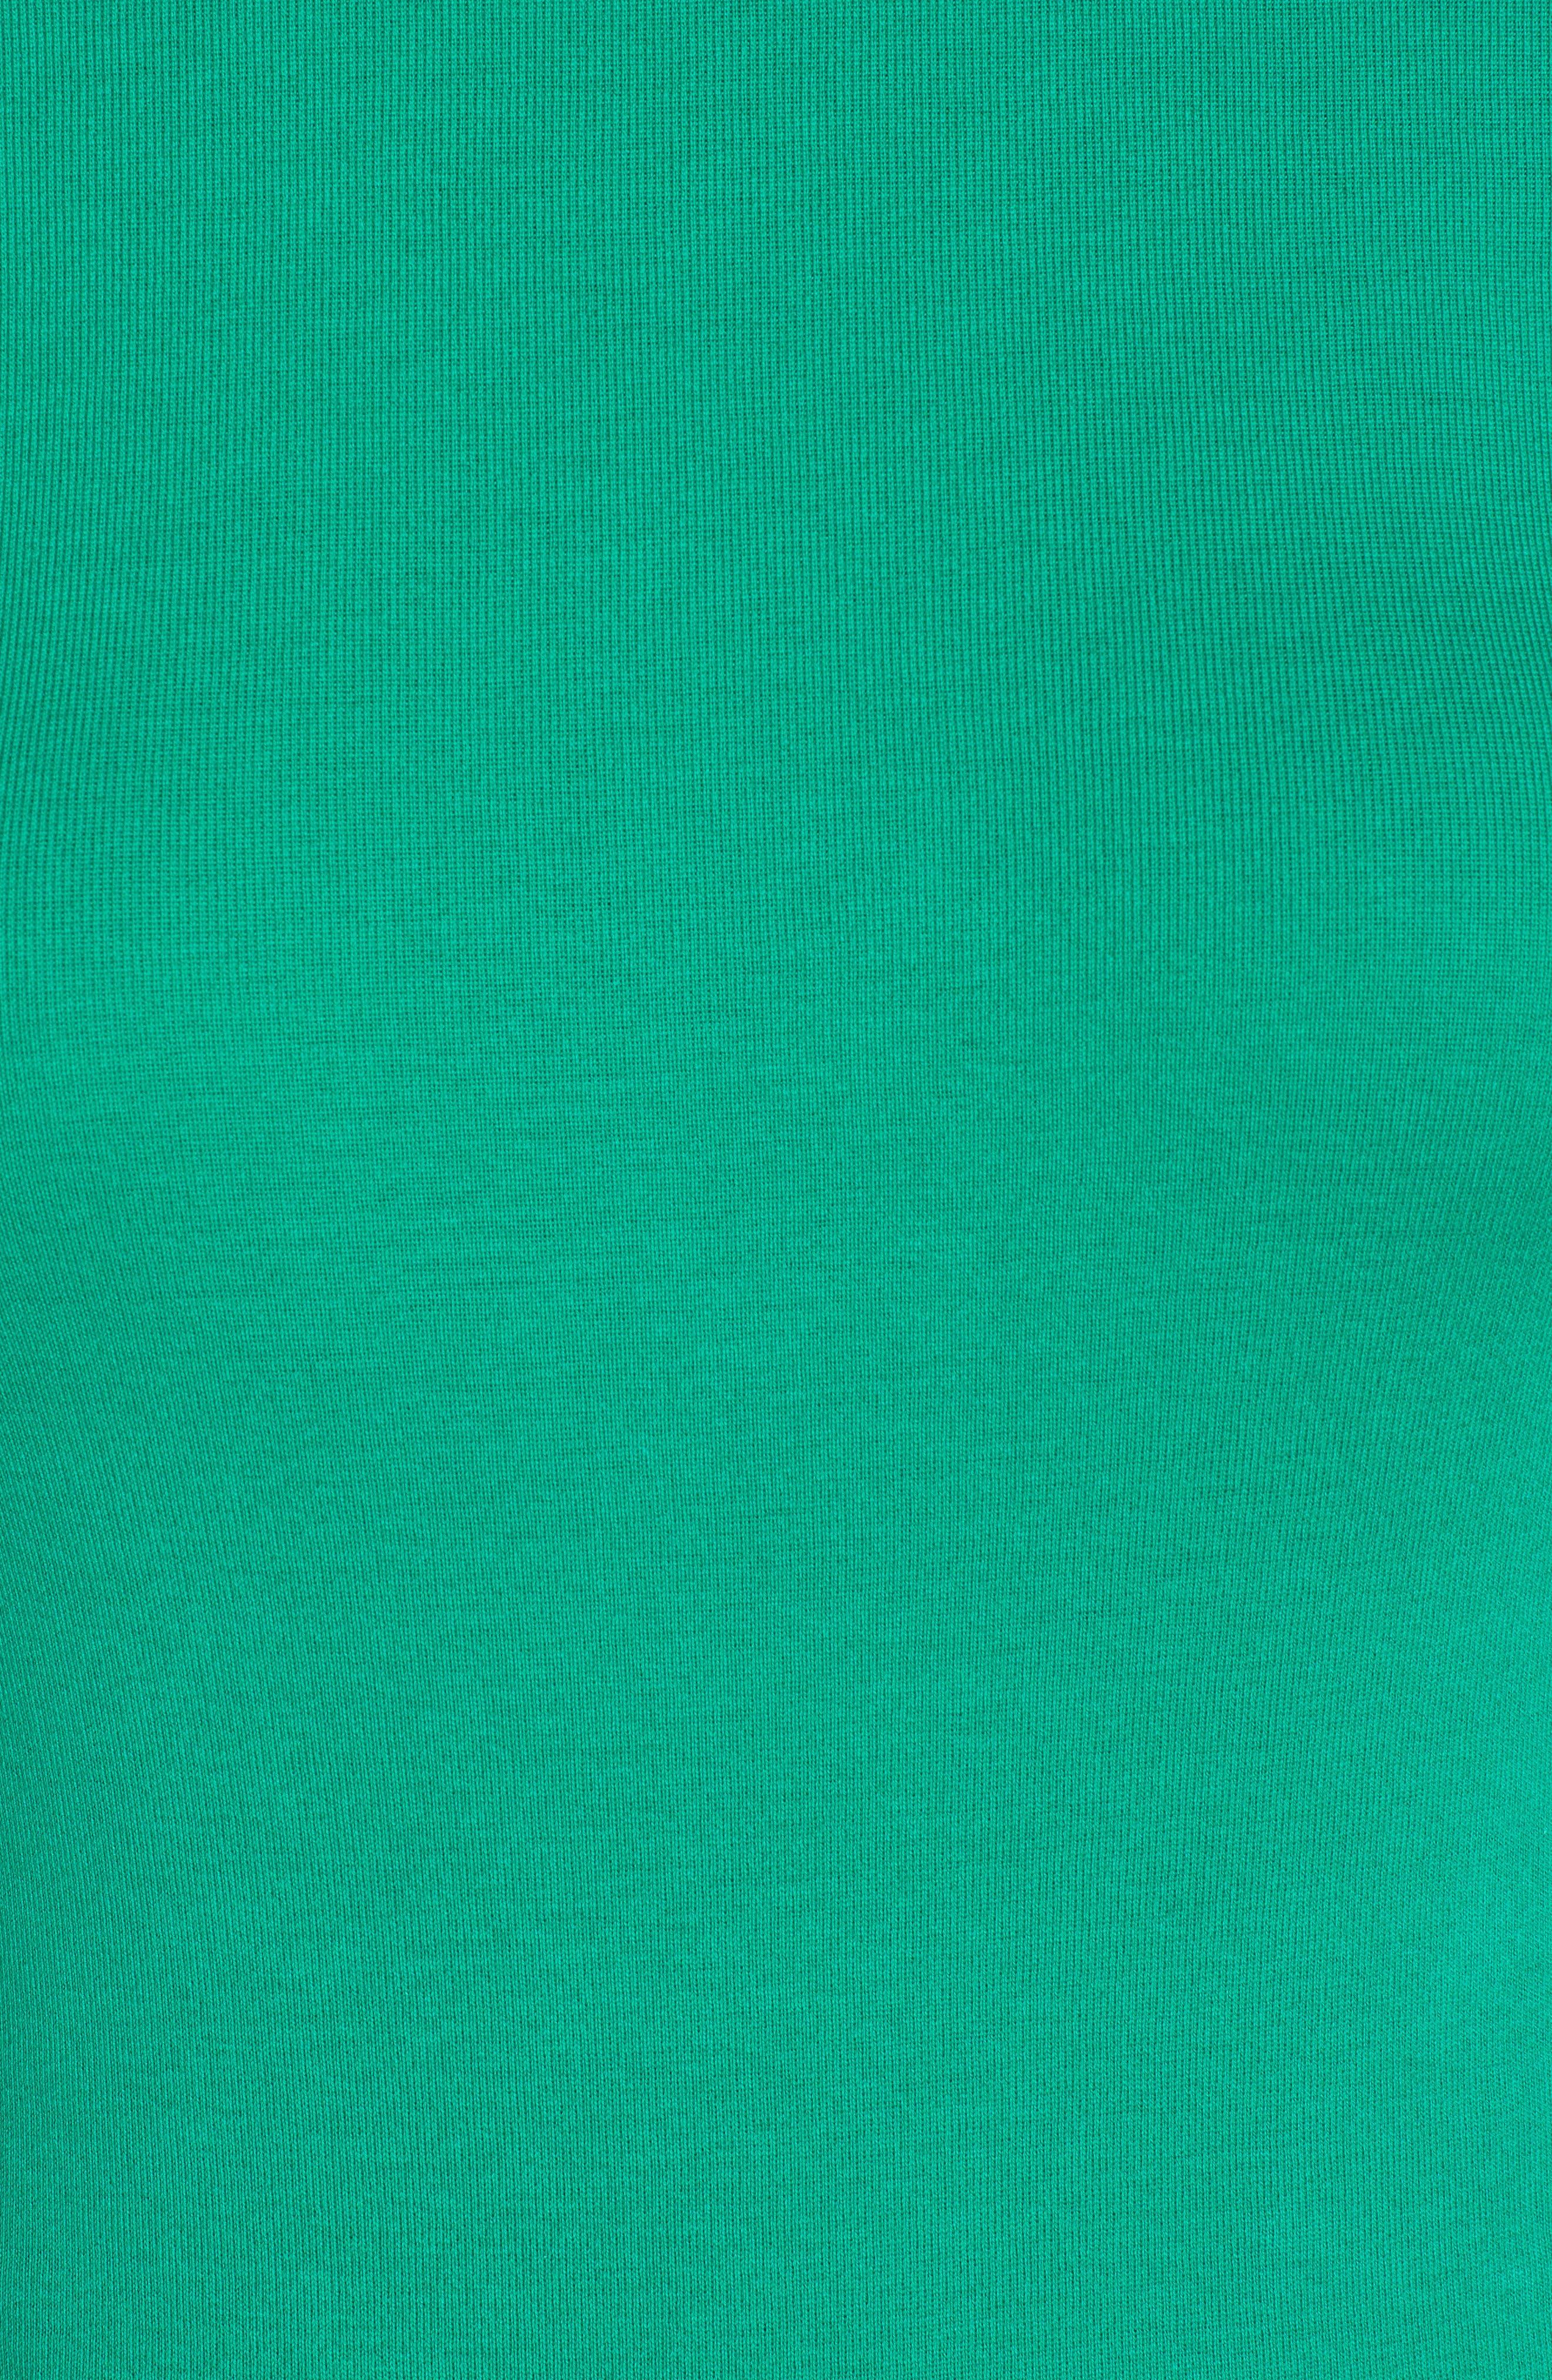 Perfect Fit Turtleneck,                             Alternate thumbnail 5, color,                             DUBLIN GREEN